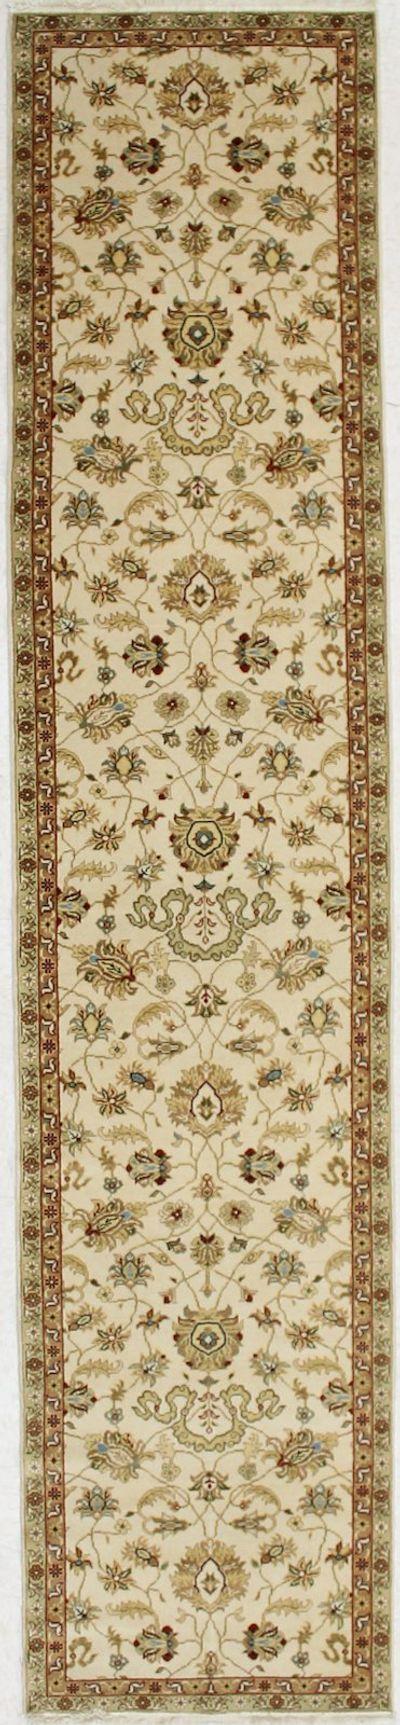 Ivory Sivas Rug #2027 • 2′9″ x 12′8″ • 100% Wool